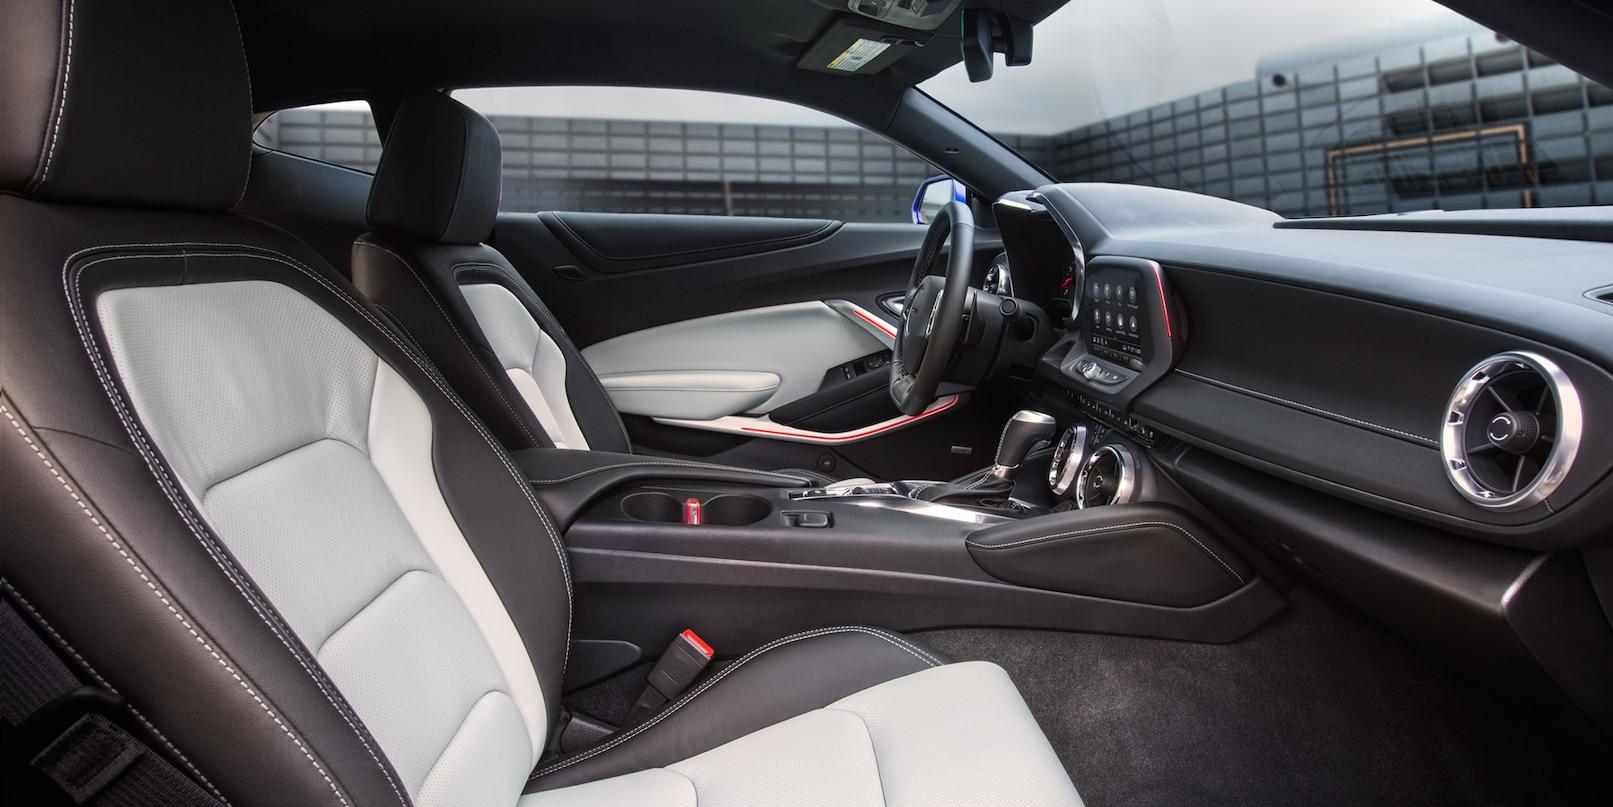 Interior of the 2019 Chevrolet Camaro